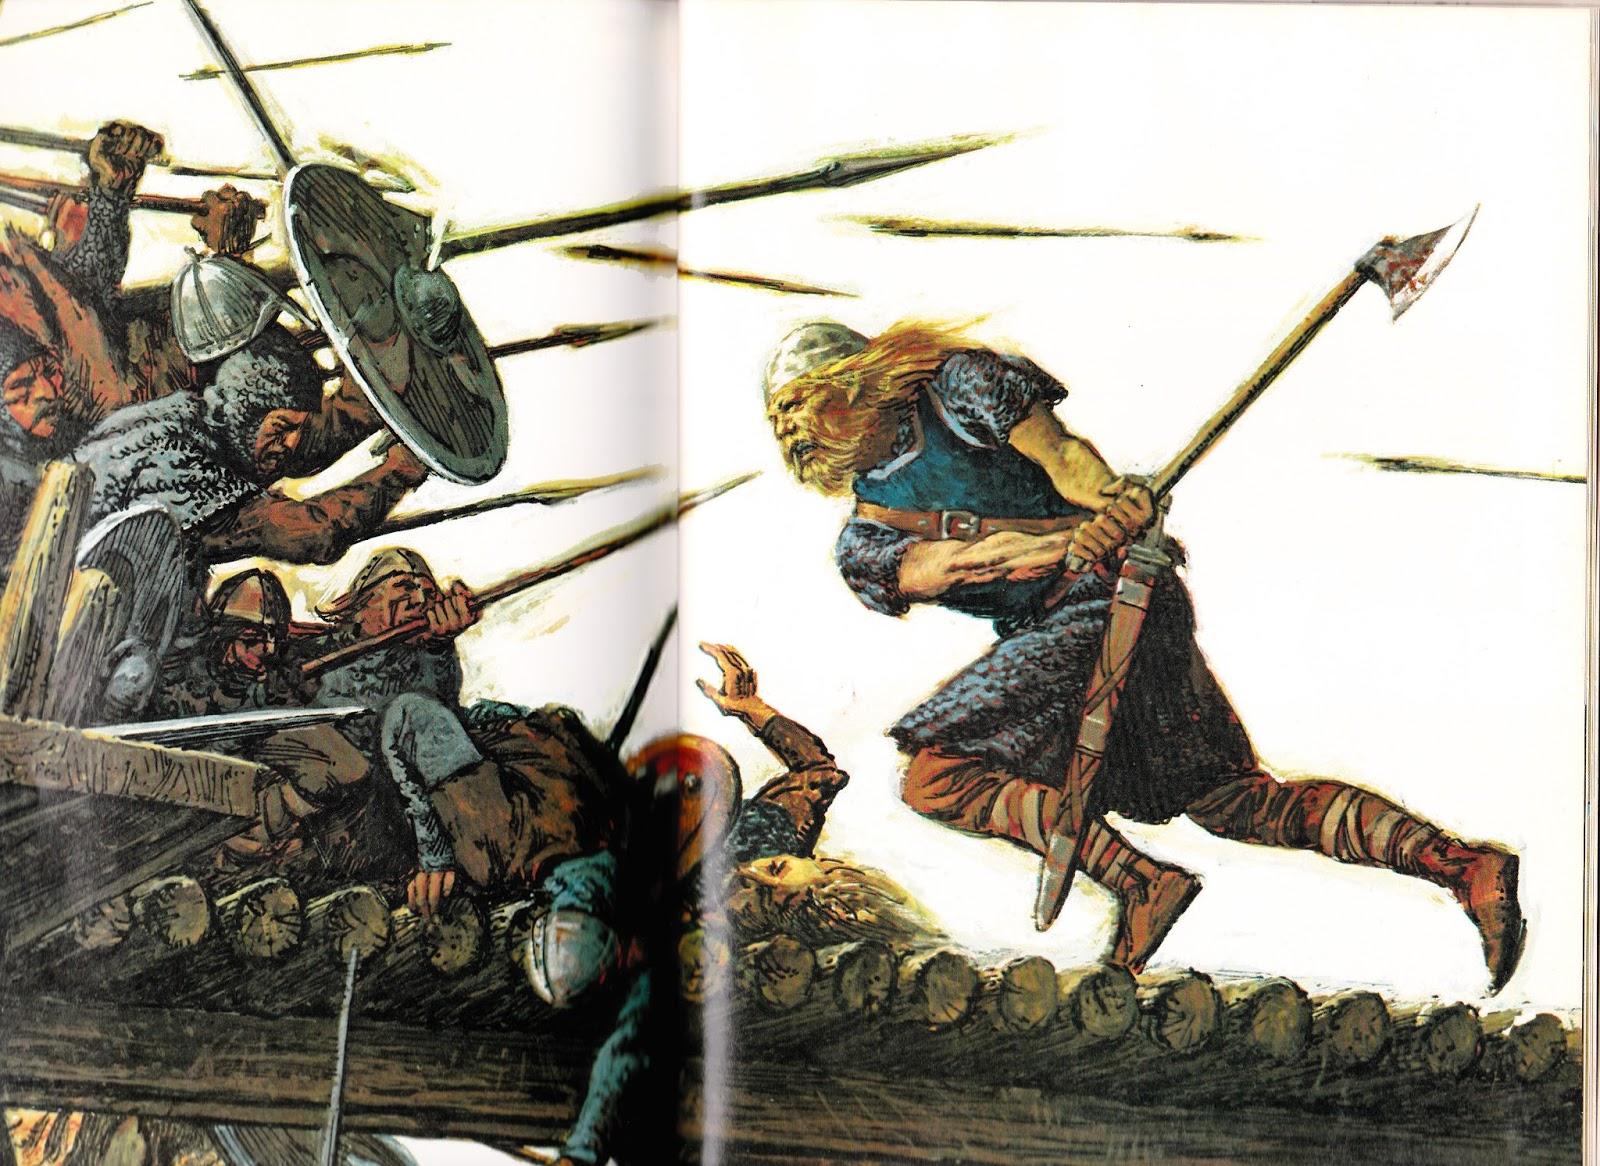 Grimfrost - Poster Art: Viking Berserker - This original ...  Viking Berserker